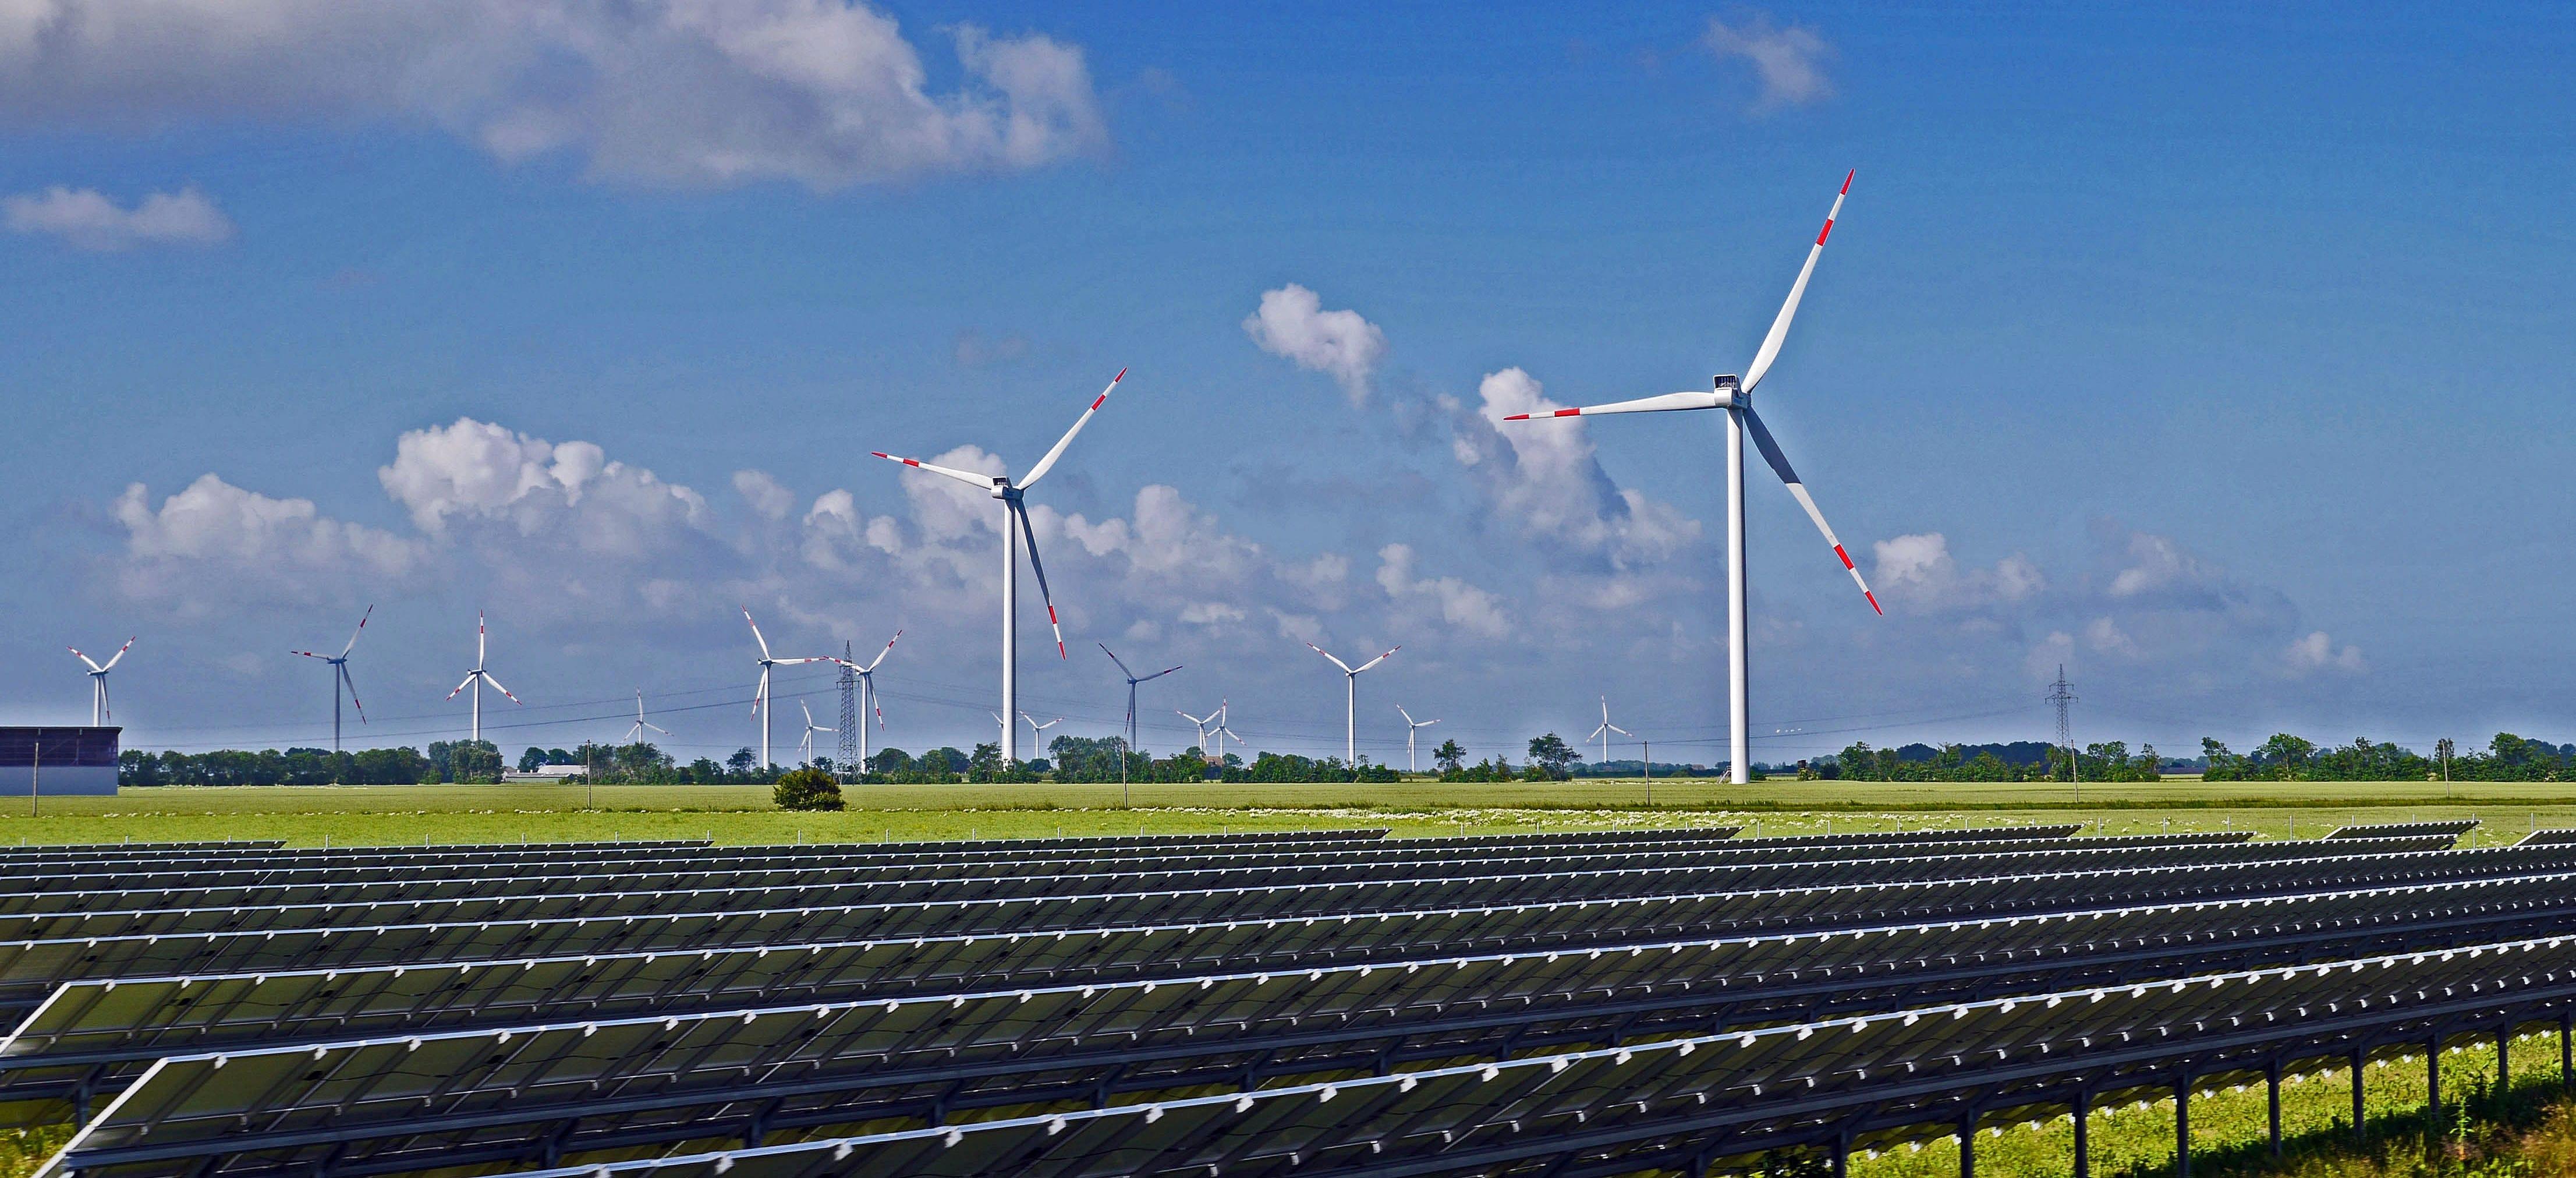 Image: Solar and Wind Park. Pixabay.com